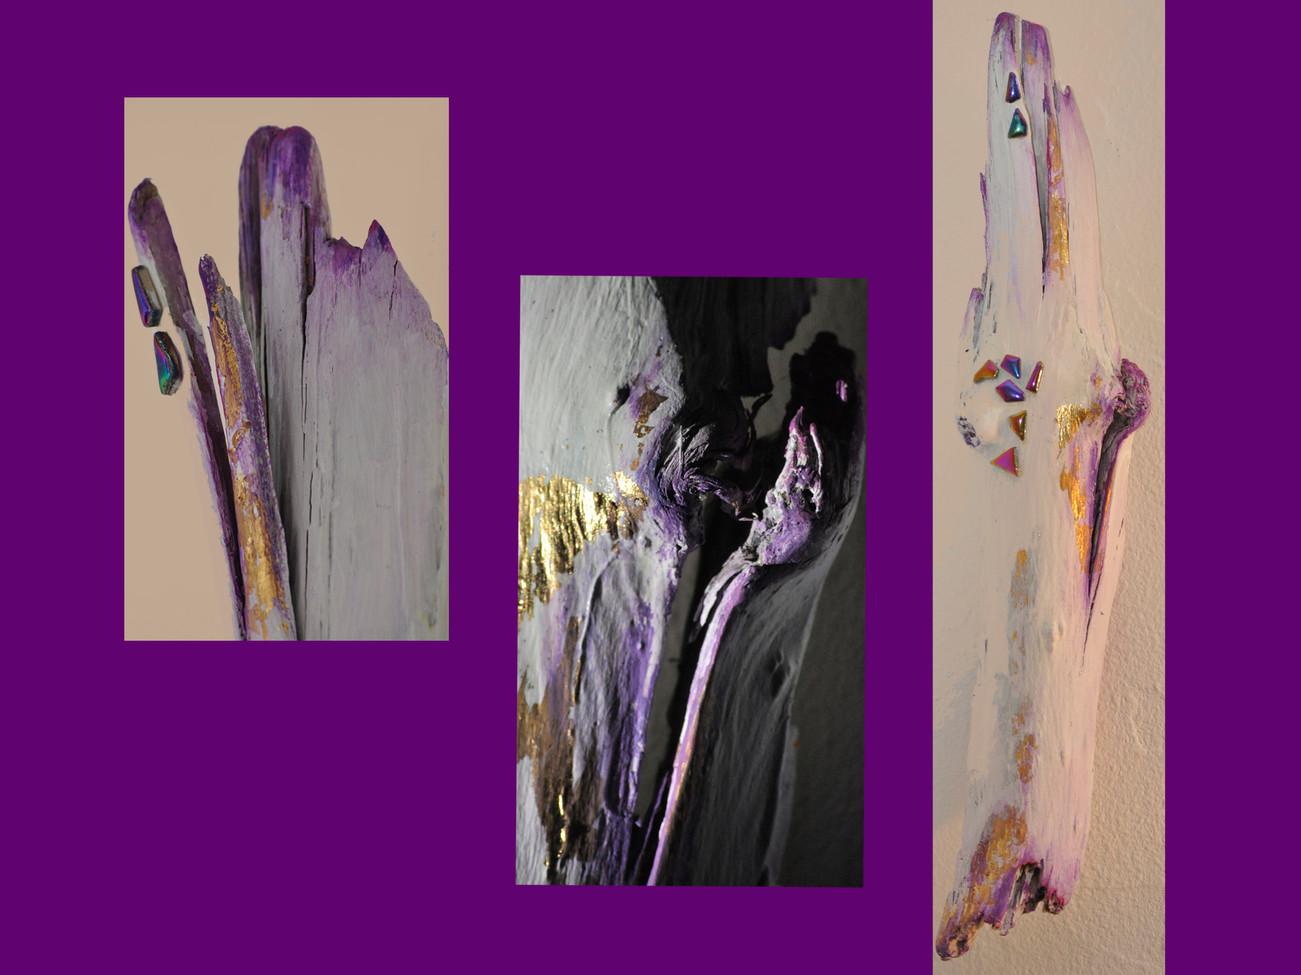 fotobuch violett weiss 4.jpg